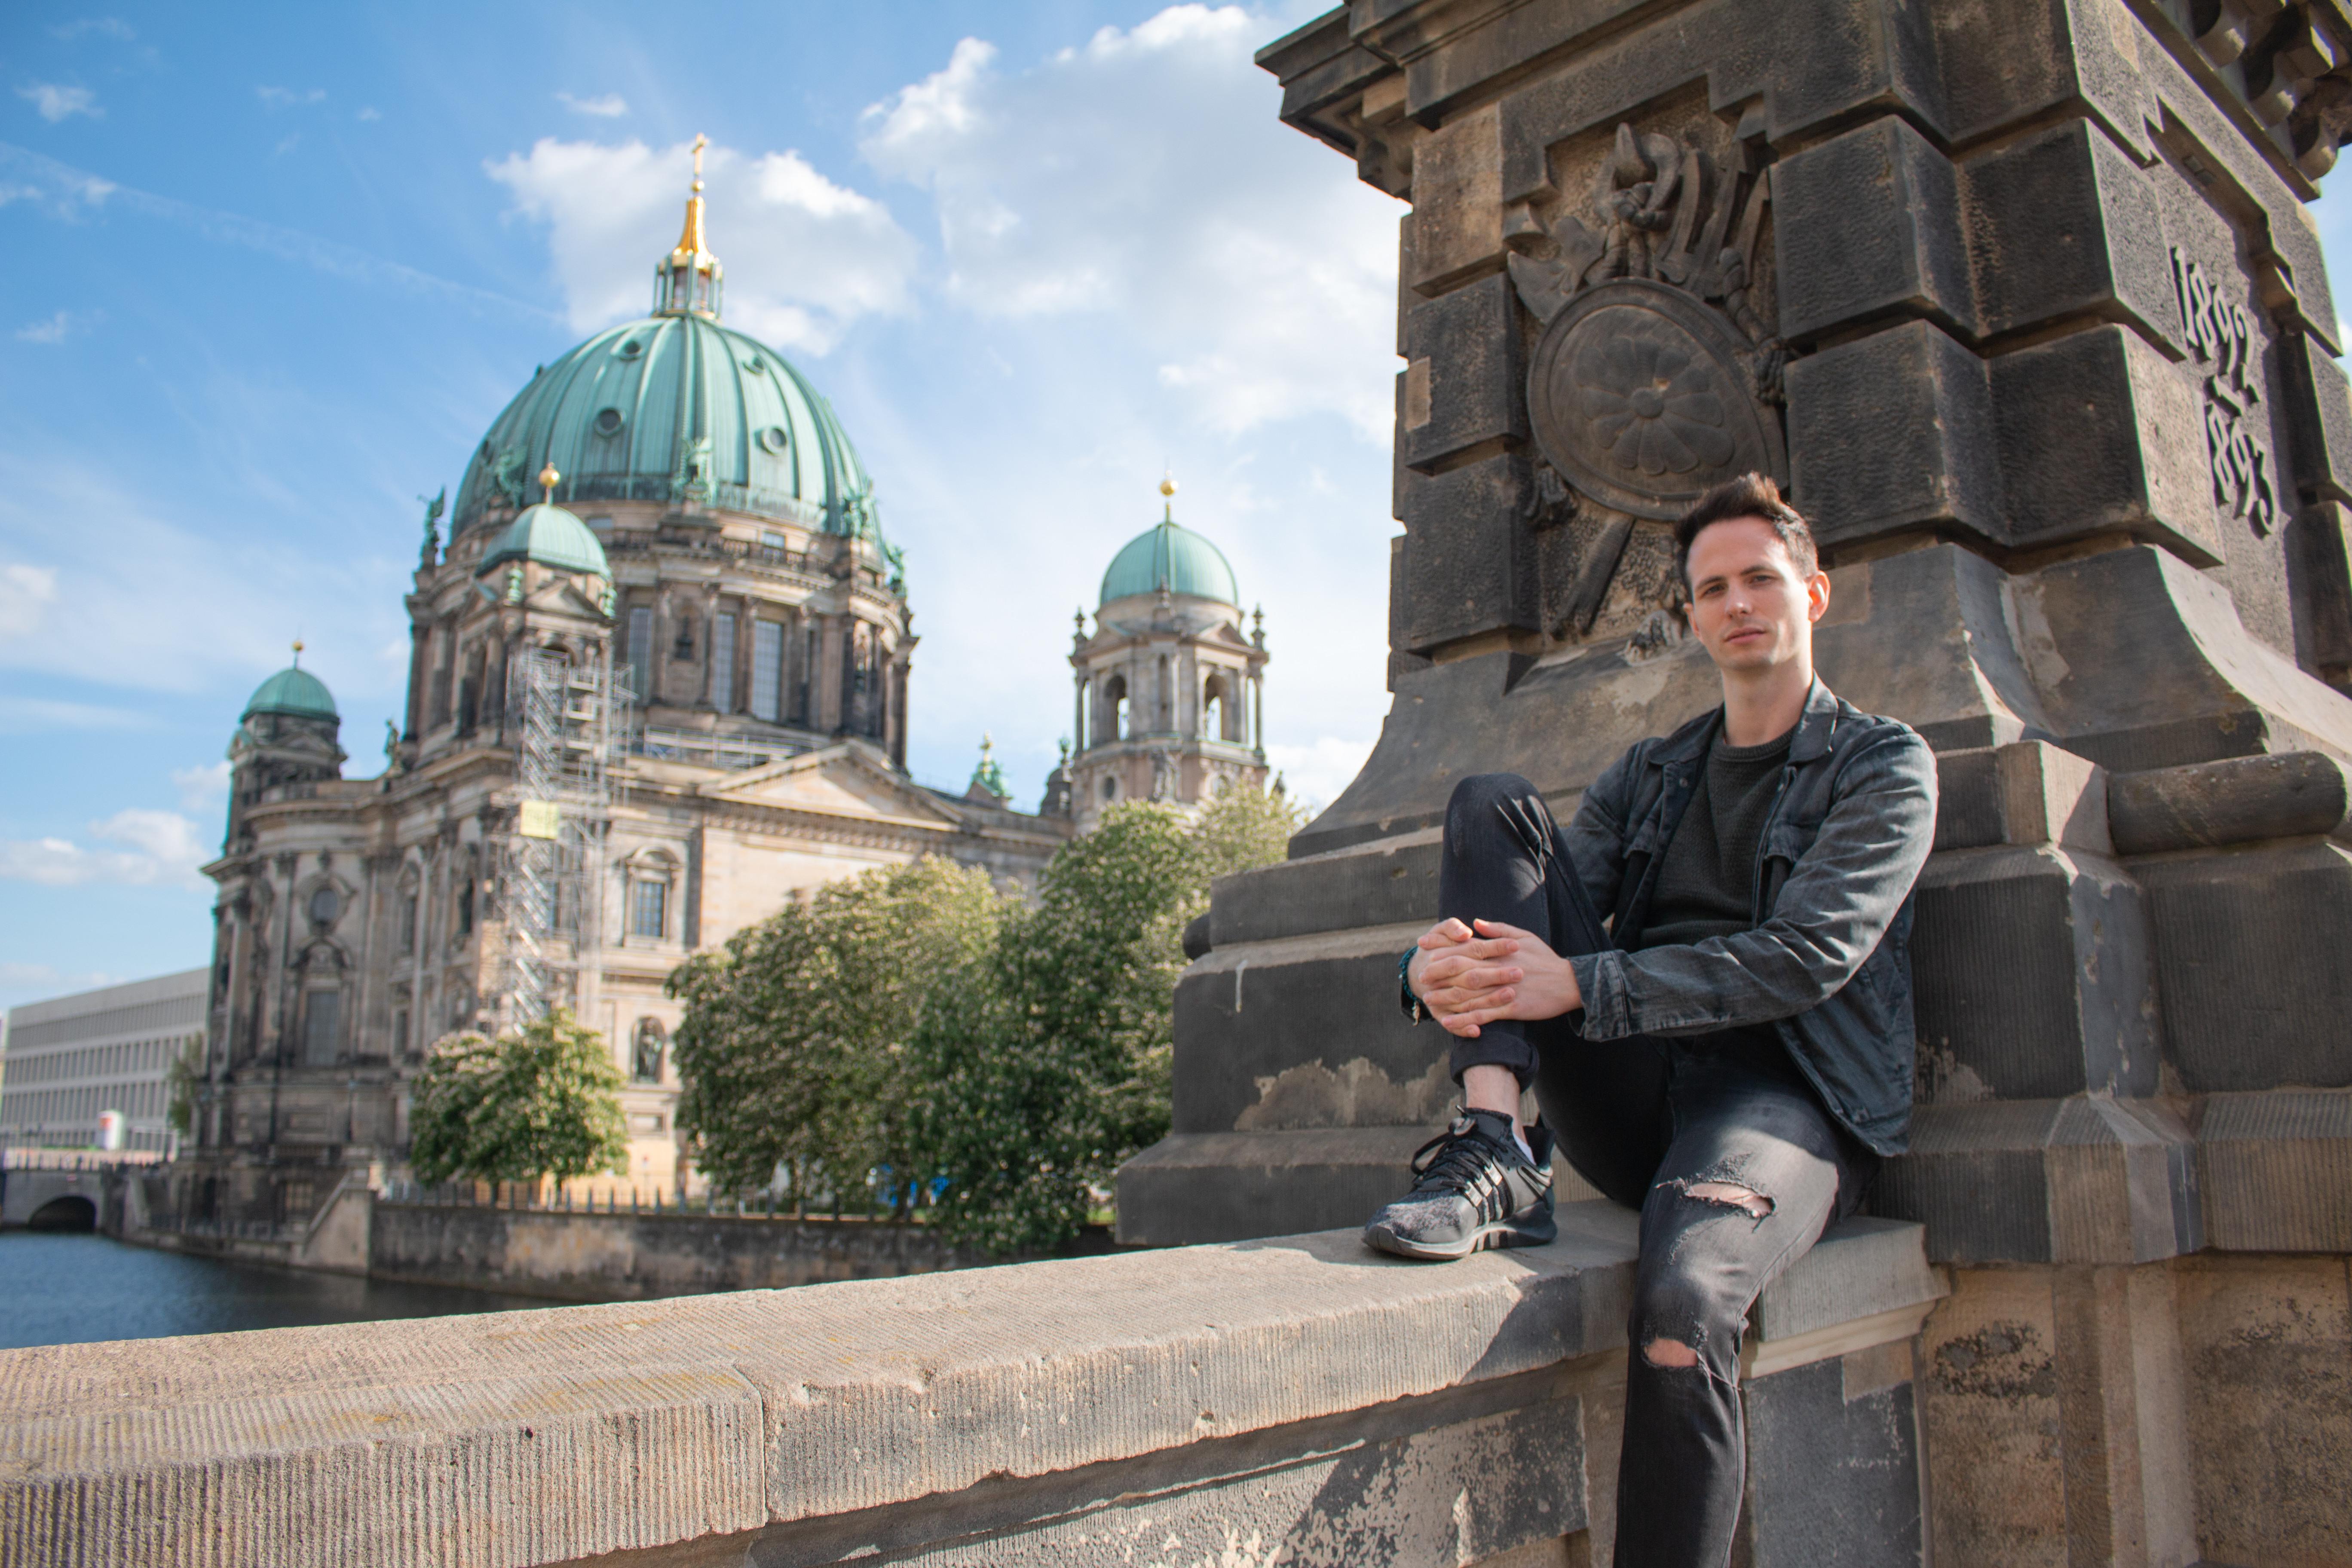 Dating Photos in Berlin